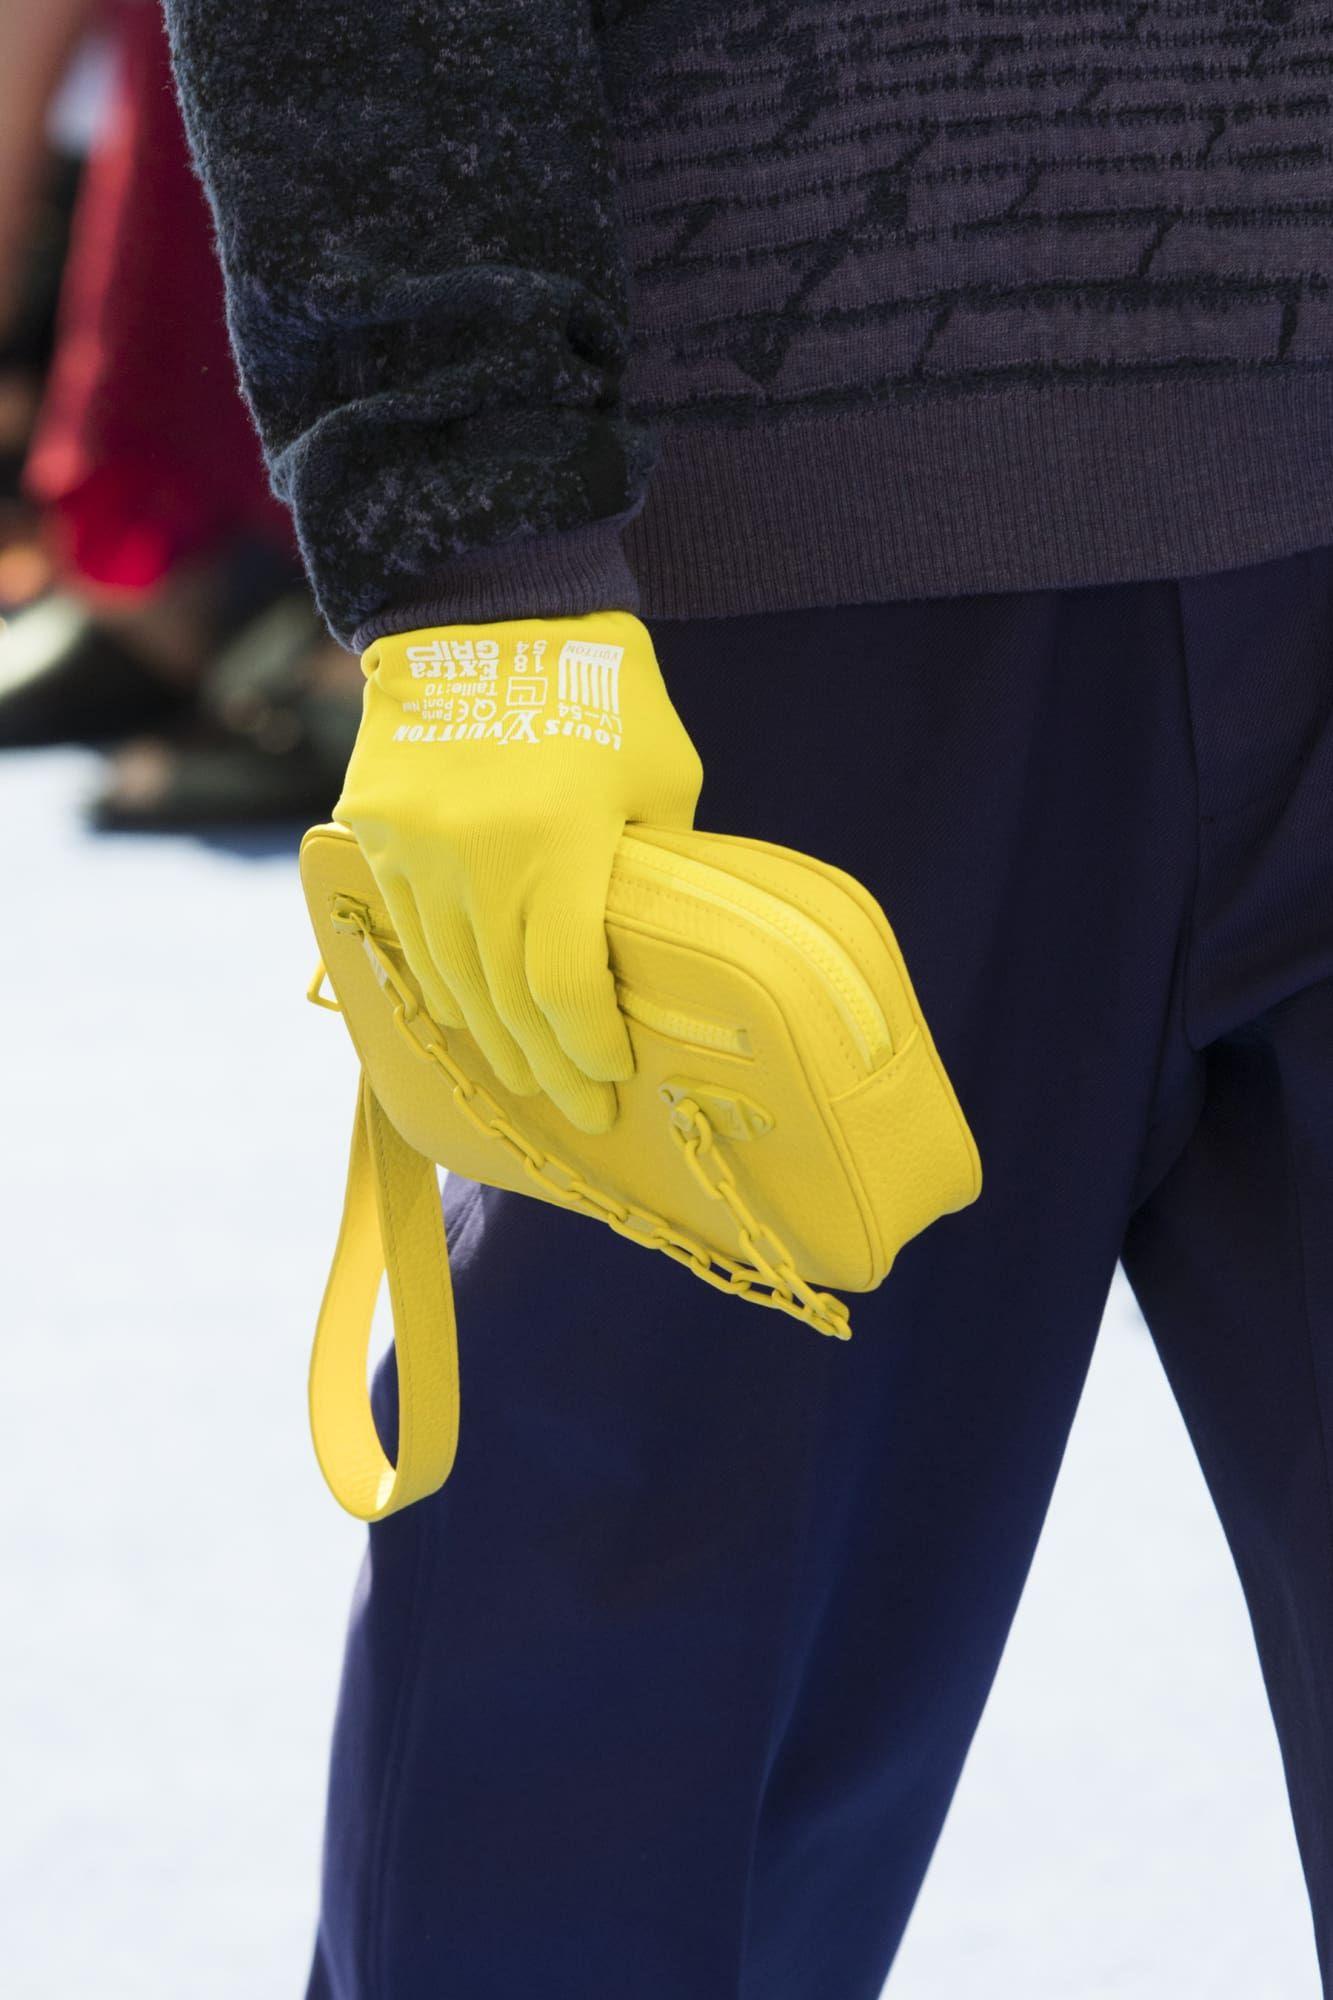 5d5328c88af4 Louis Vuitton Men s Spring Summer 2019 Sneakers Sunglasses Bags Accessories  - Fashionista